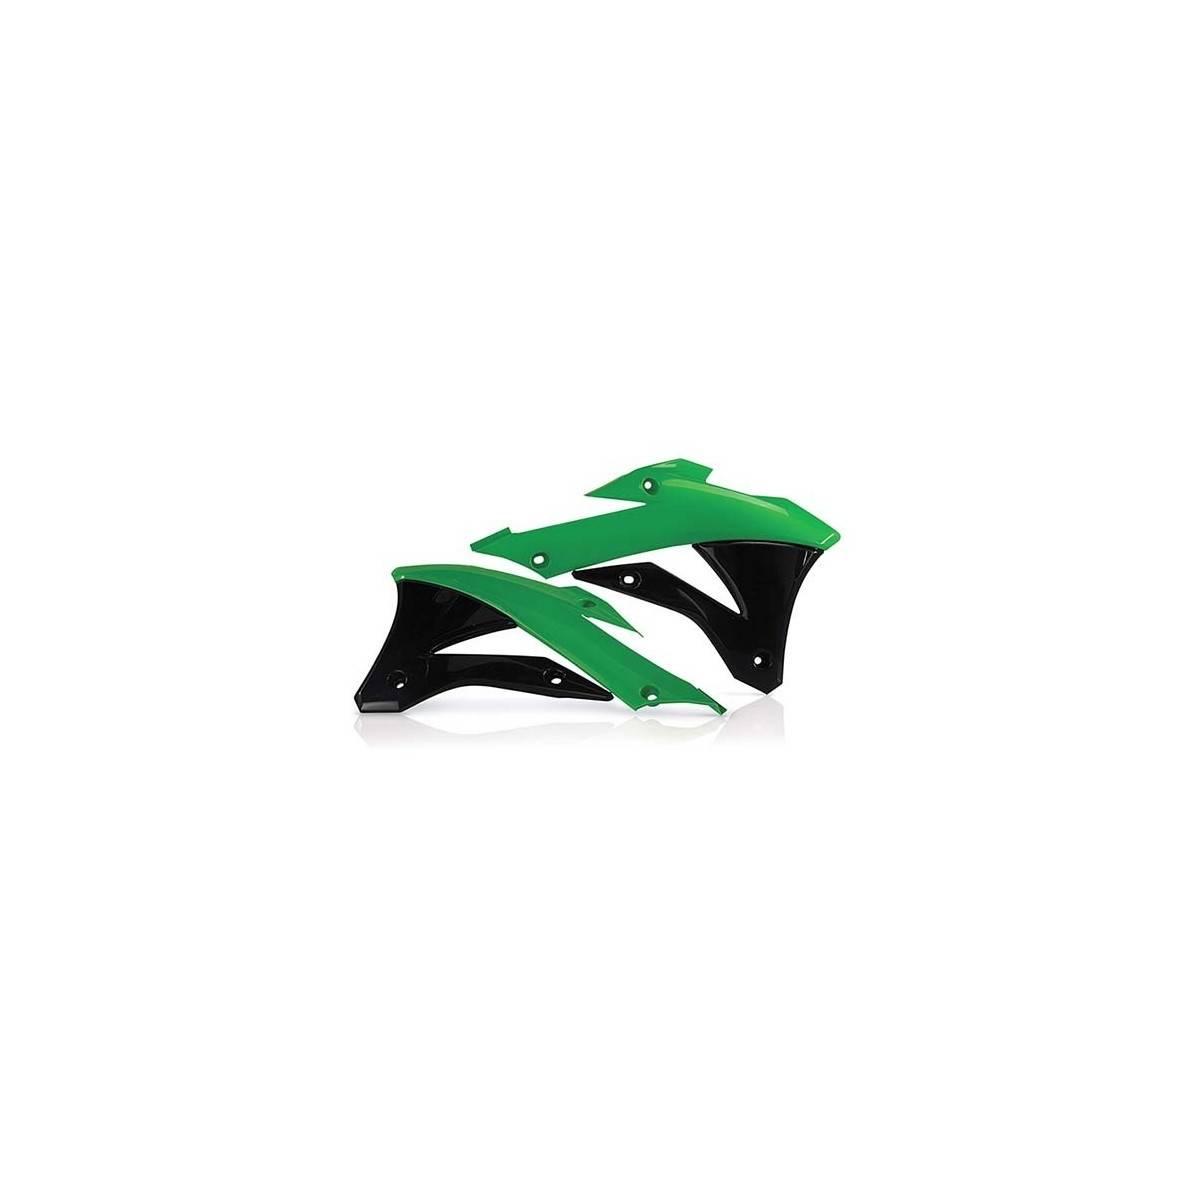 0017242-377 - Tapa Radiador Kx85 100 14 18 Verde Negro